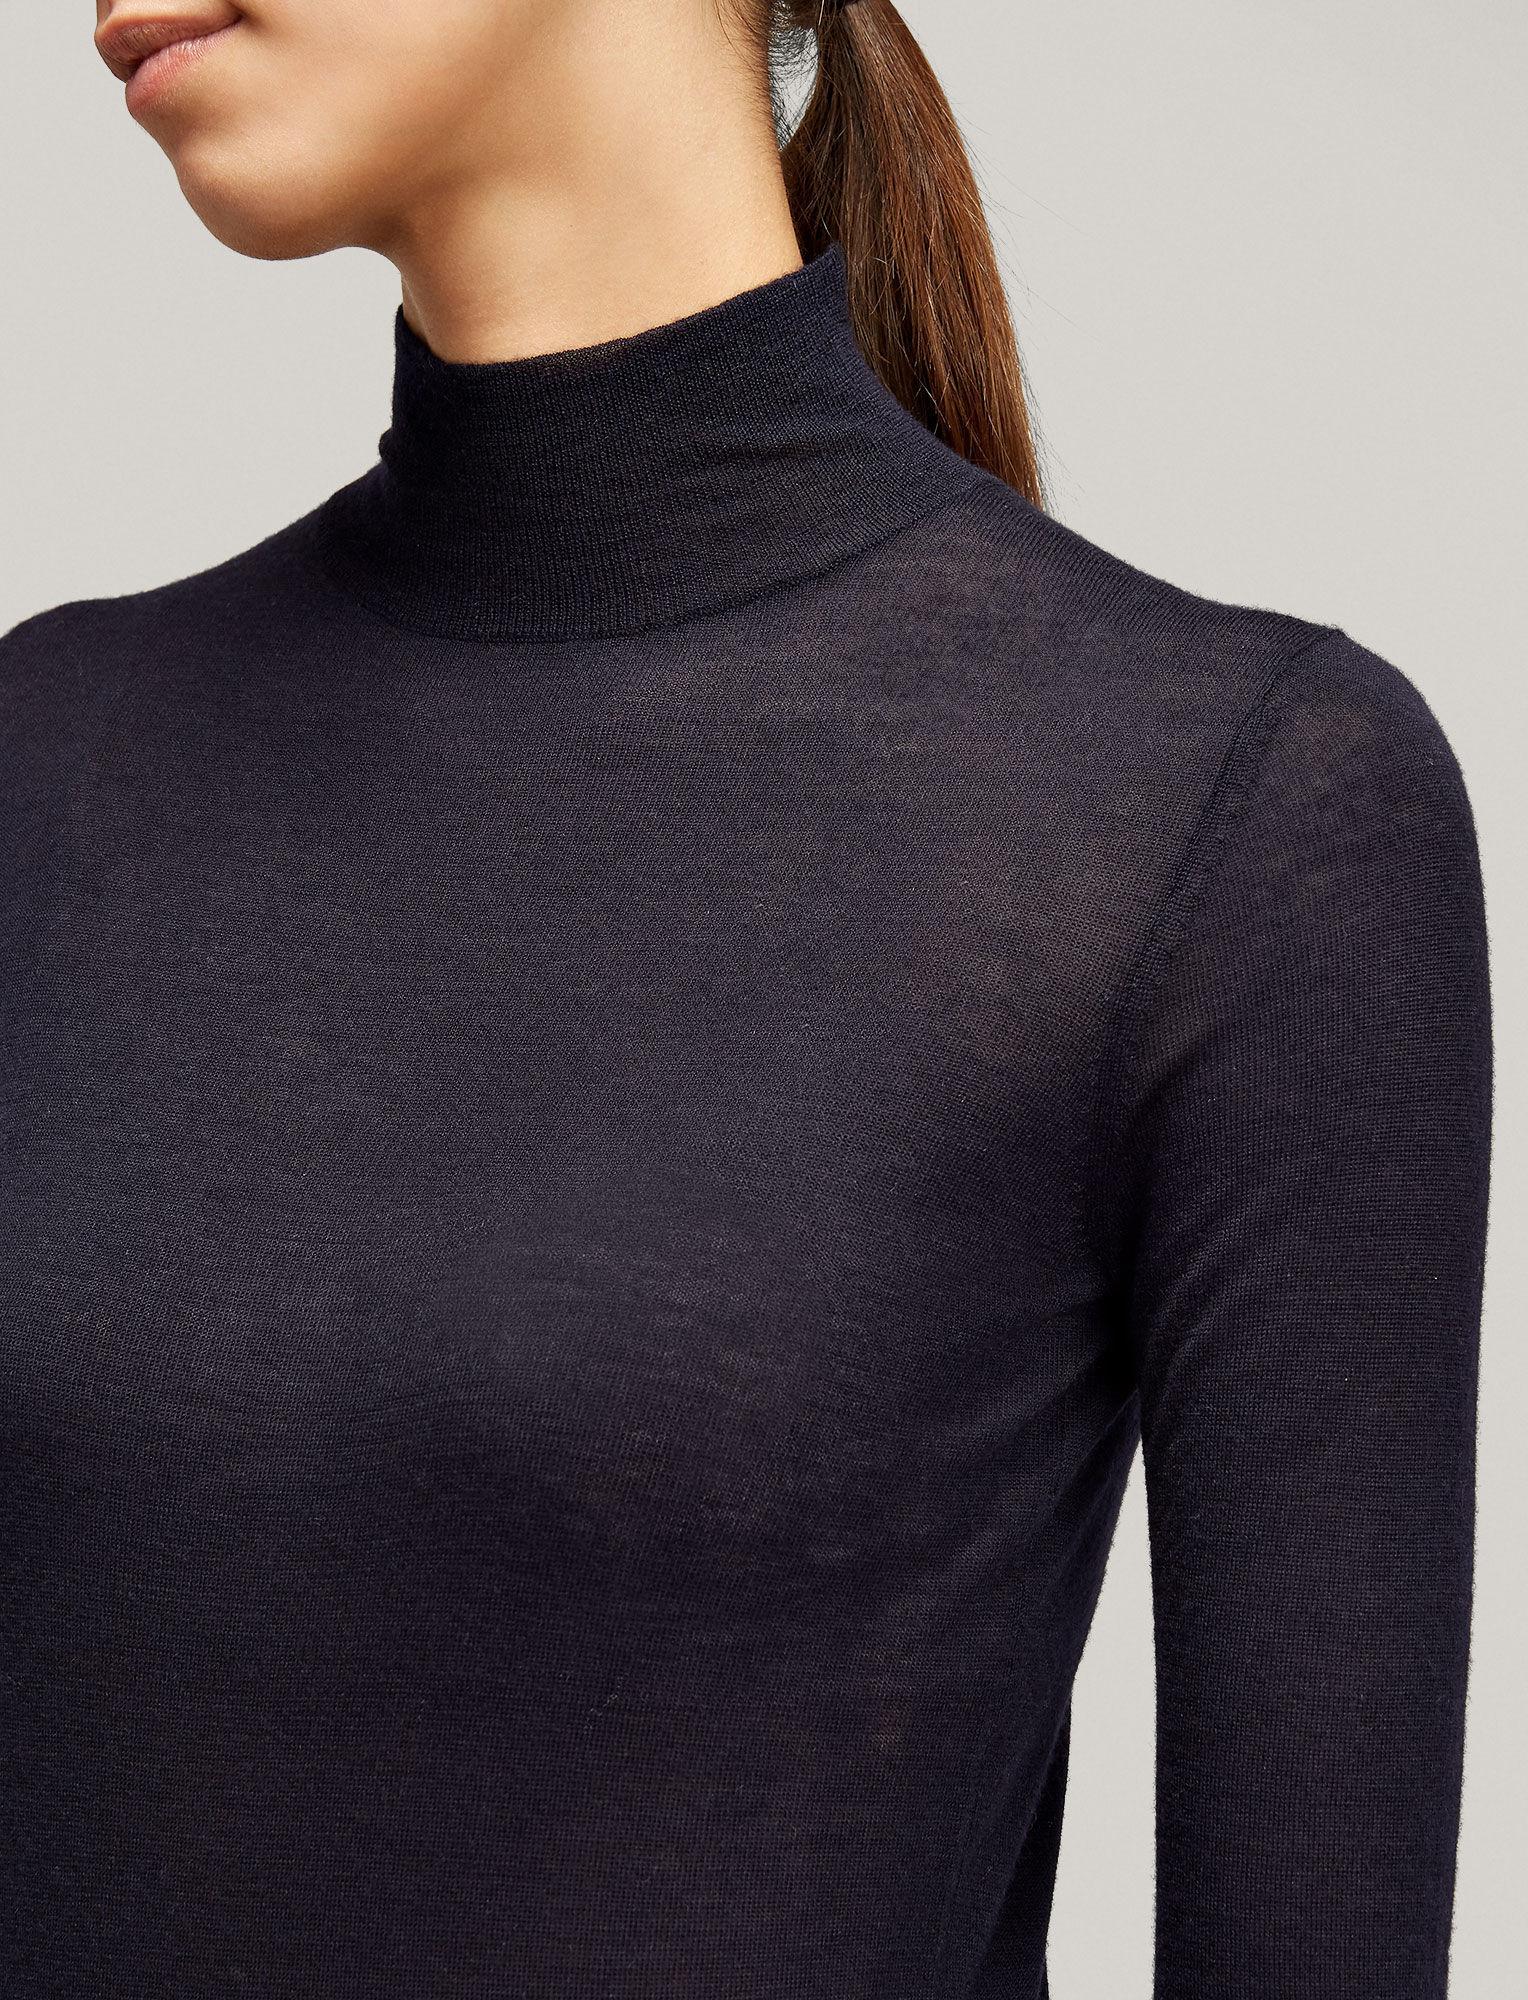 High neck ls knit cashair navy